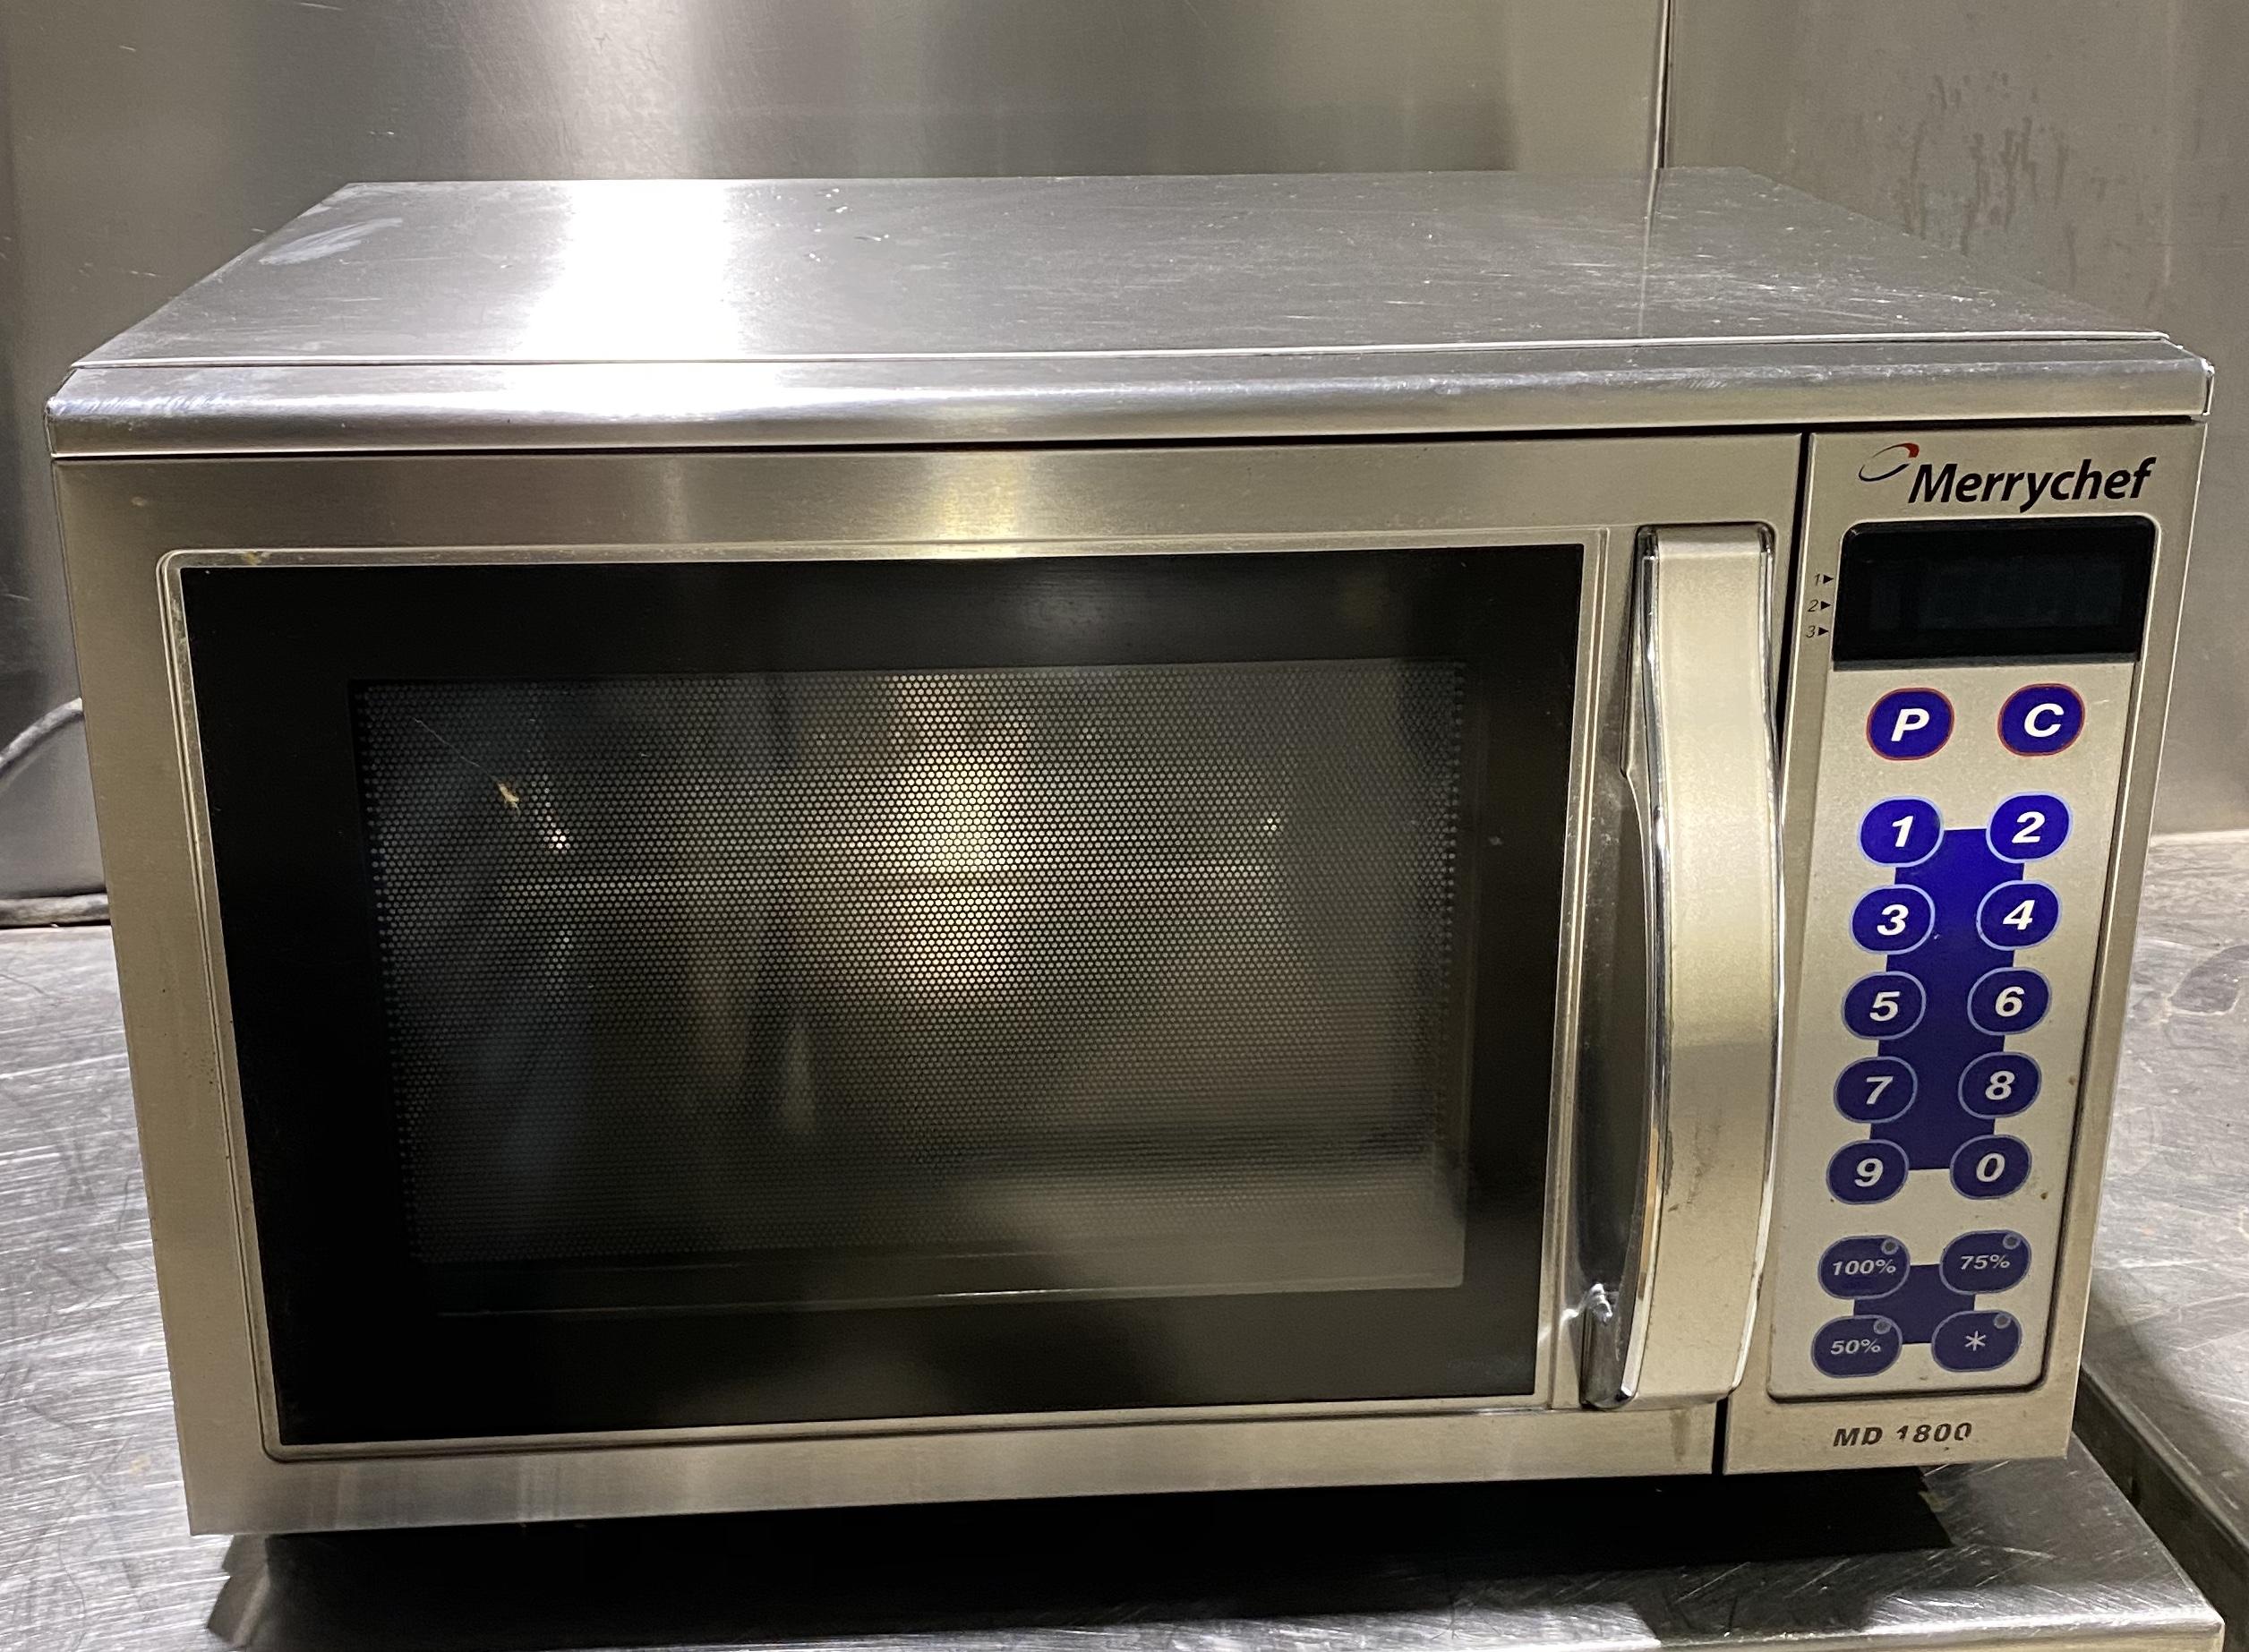 MERRYCHEF 1800 Watt Commercial Microwave